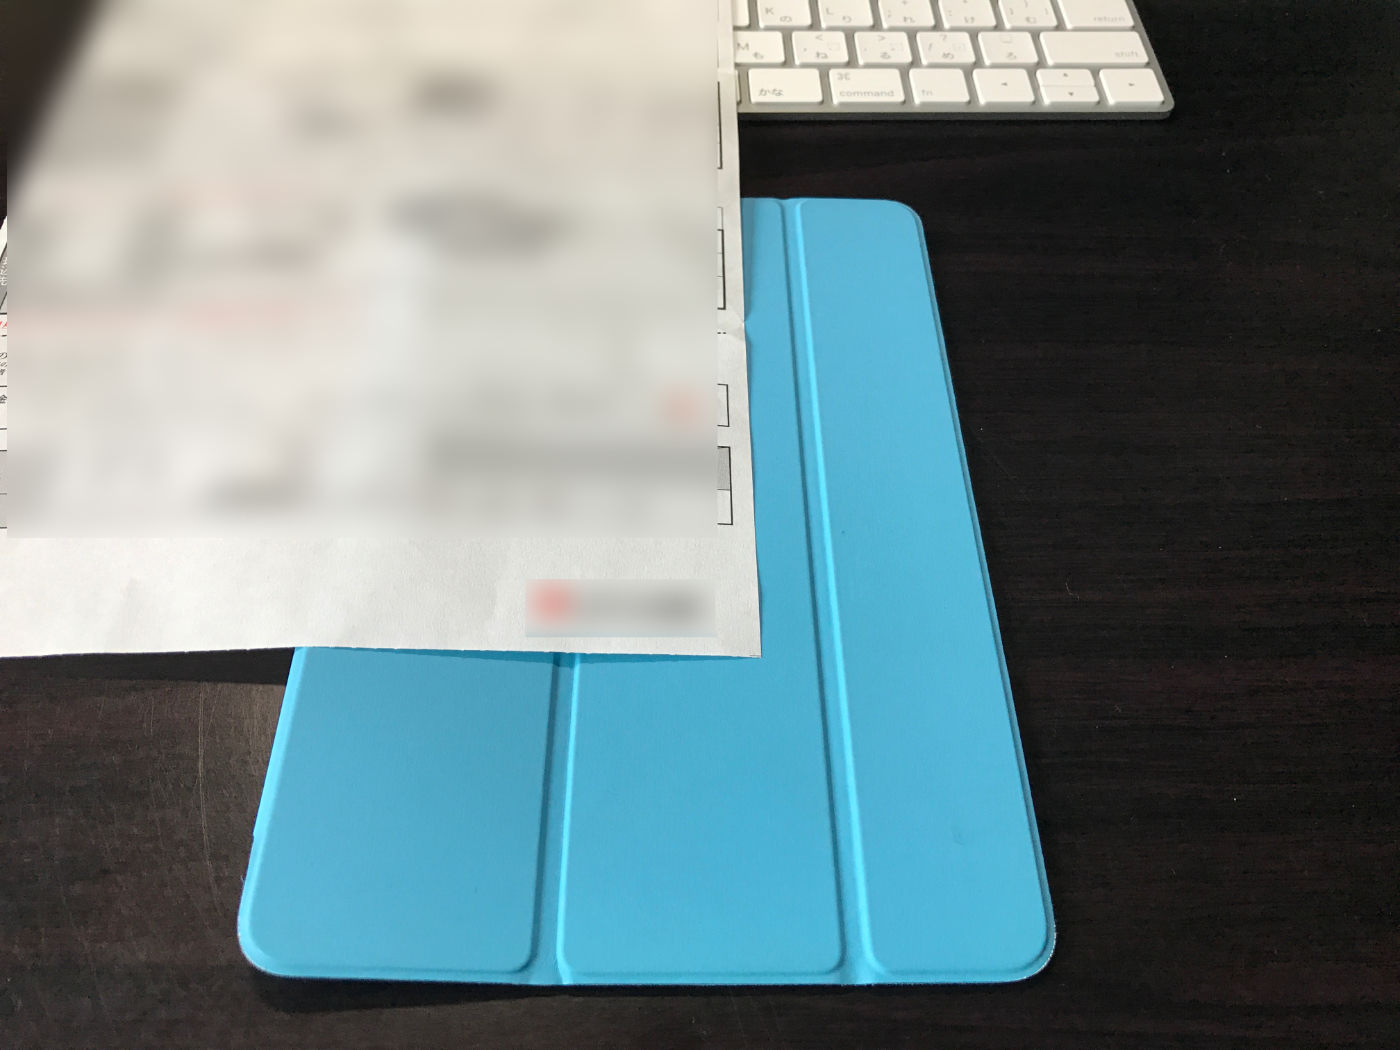 [iPad mini 4]どうでもいいことだけど、もう一つのiPad mini 4(SmartCover)の使い方について